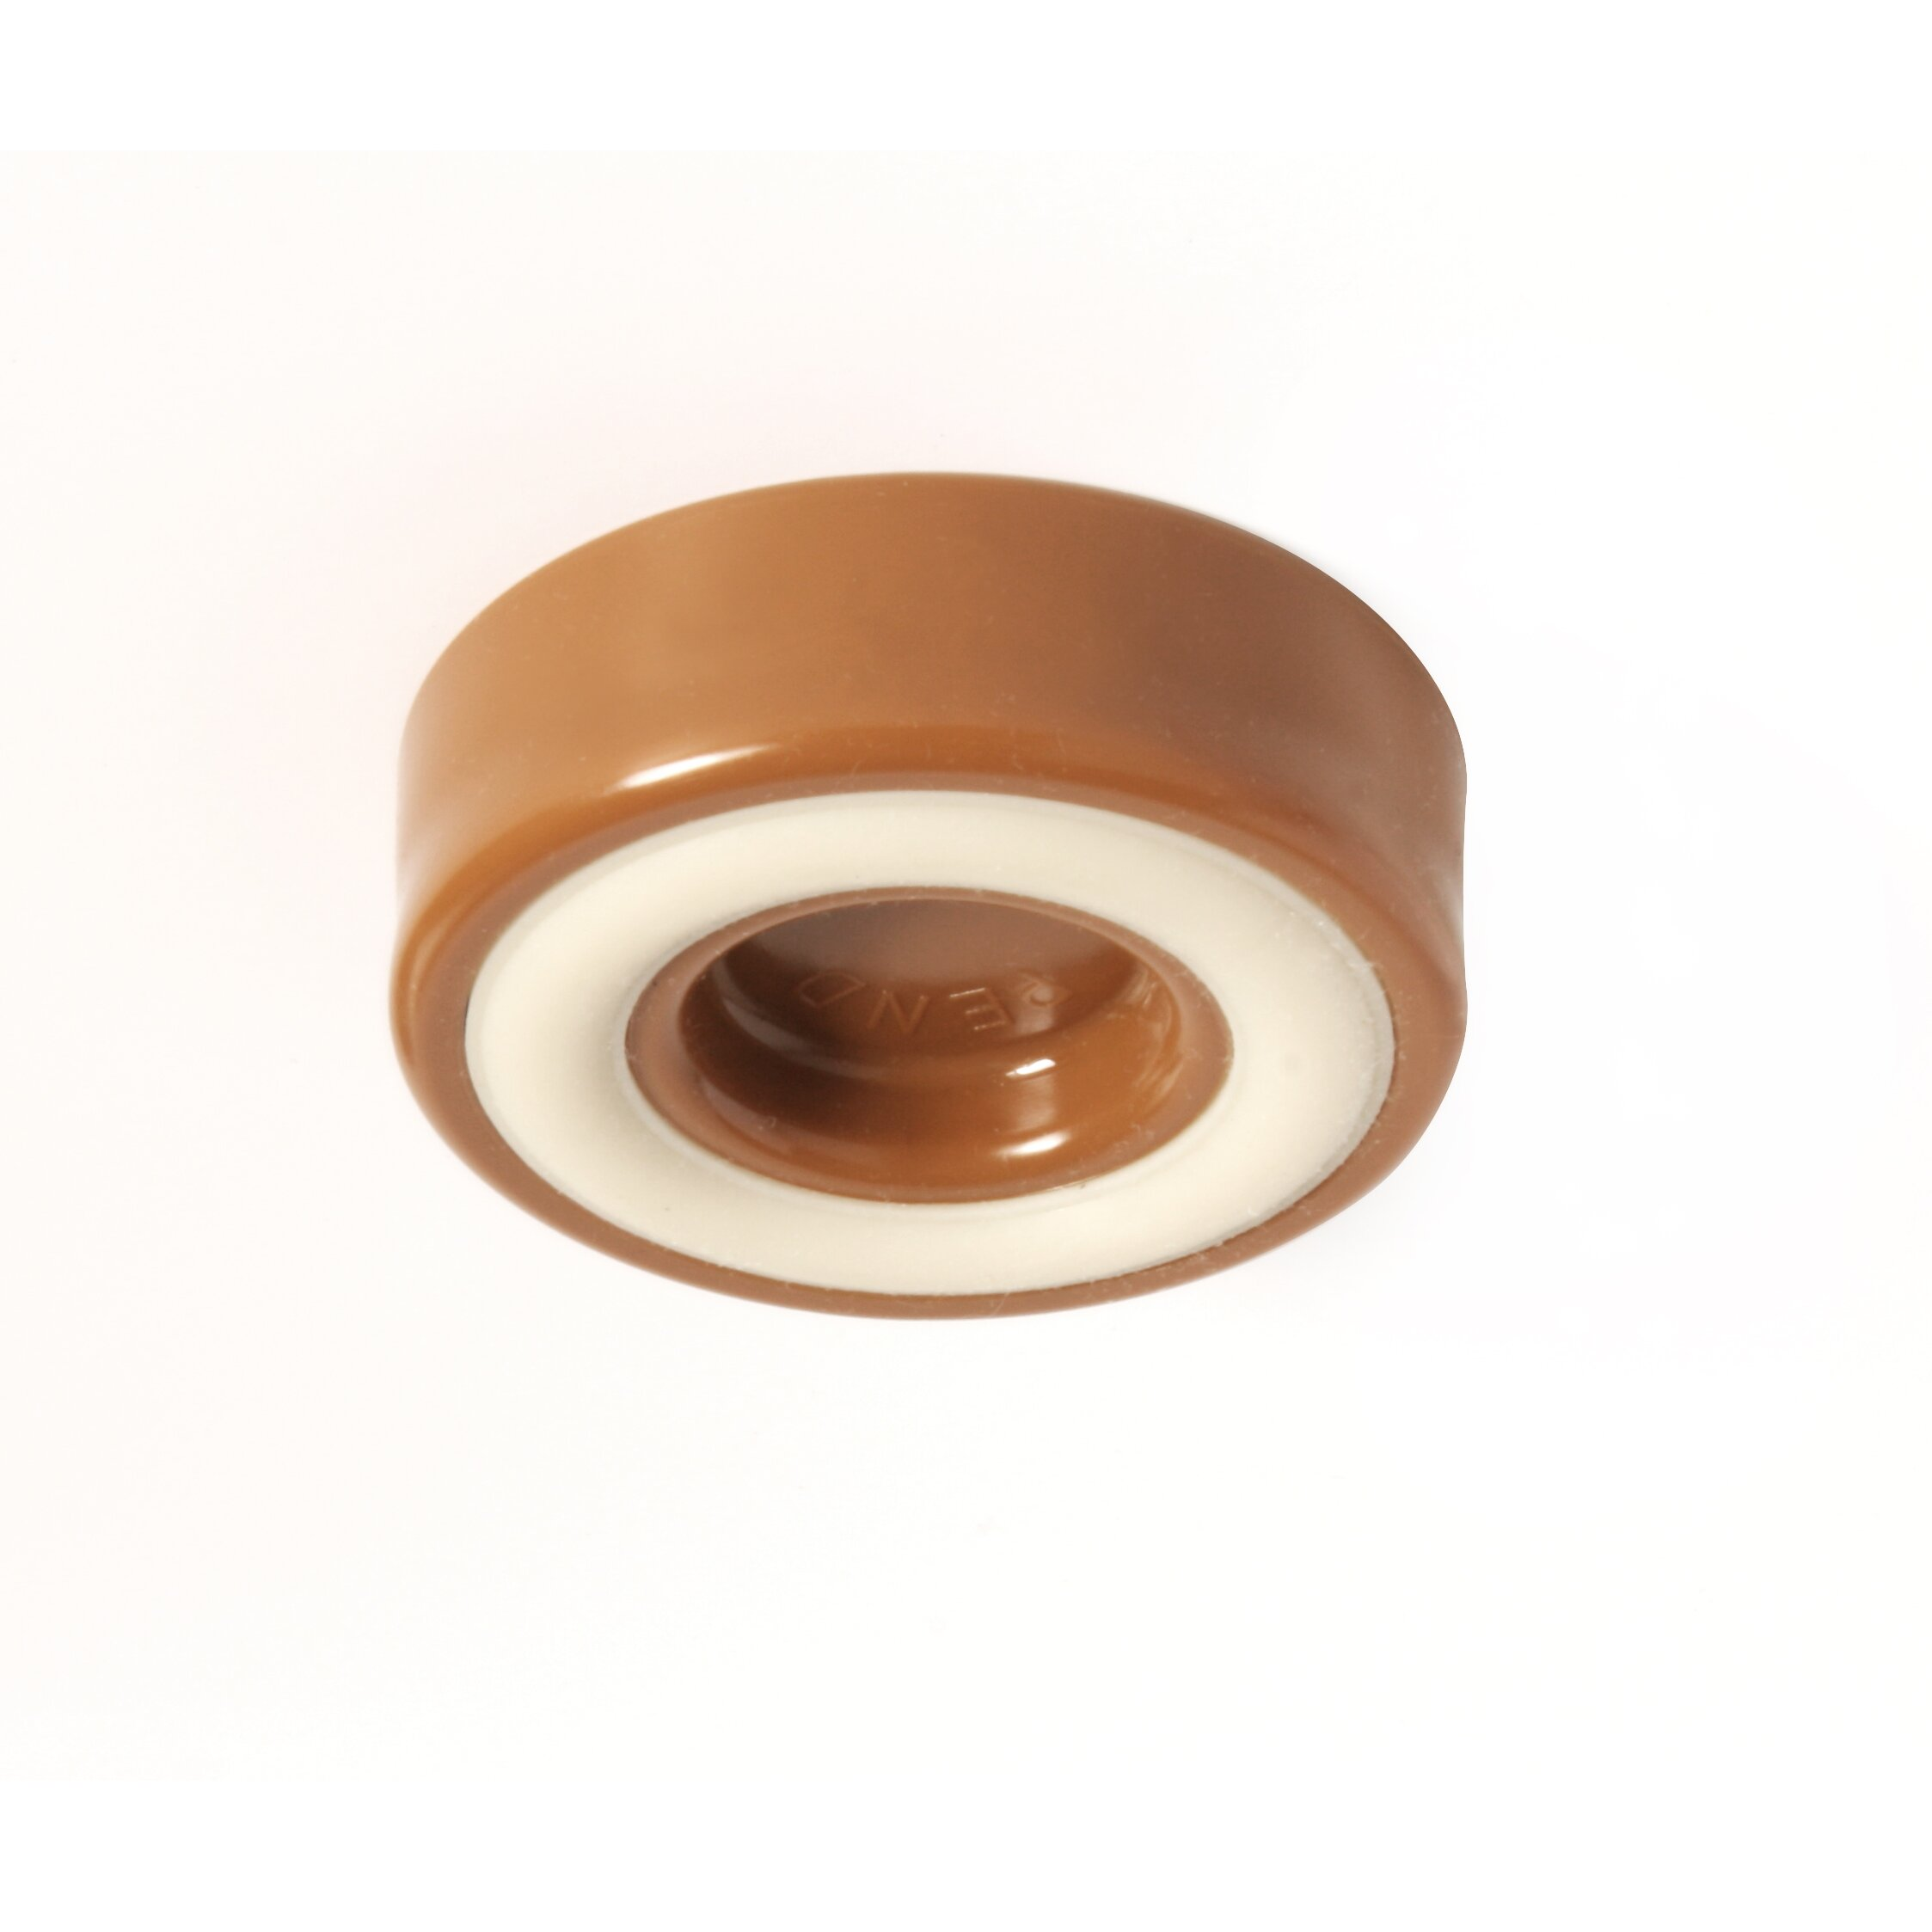 Slipstick Furniture Leg Floor Protector Coaster Cup Reviews Wayfair Supply